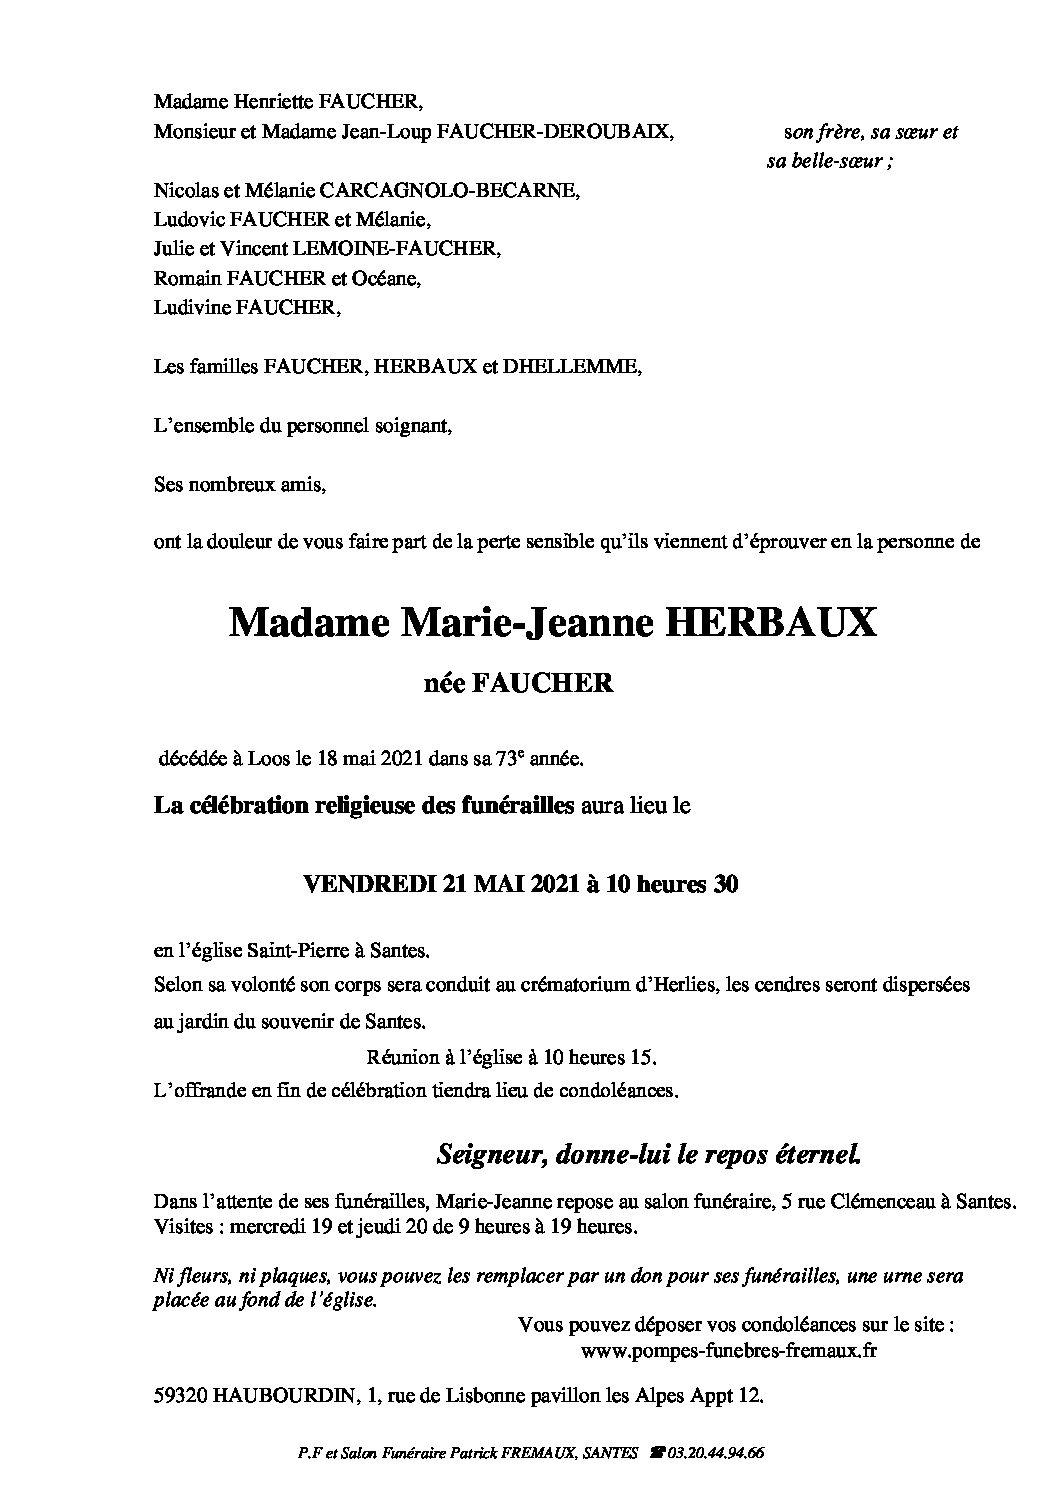 Madame Marie-Jeanne HERBAUX née FAUCHER